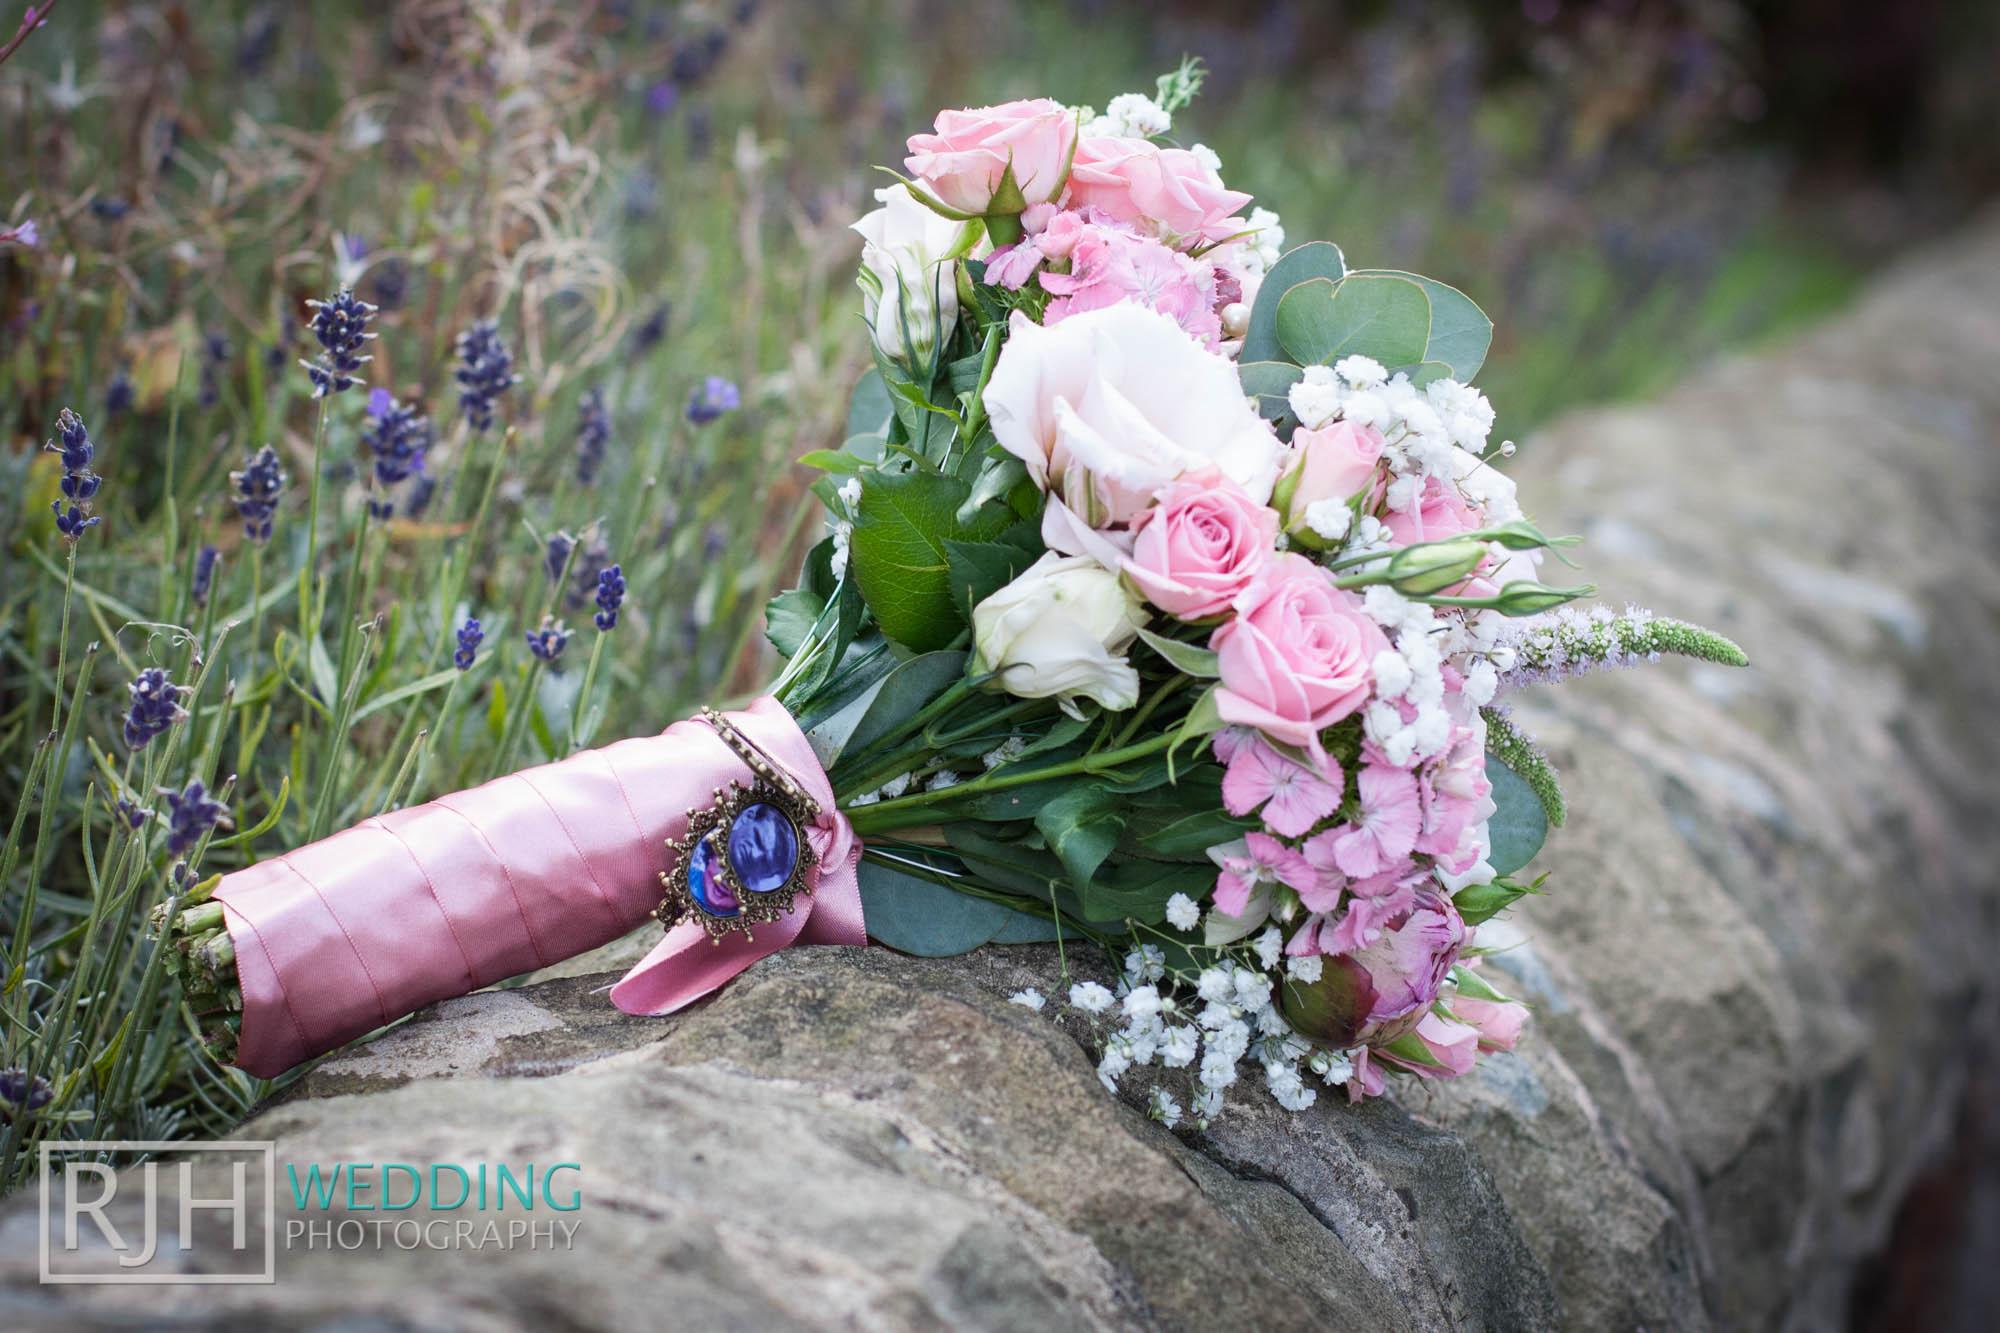 RJH Wedding Photography_Tankersley Manor Wedding_08.jpg